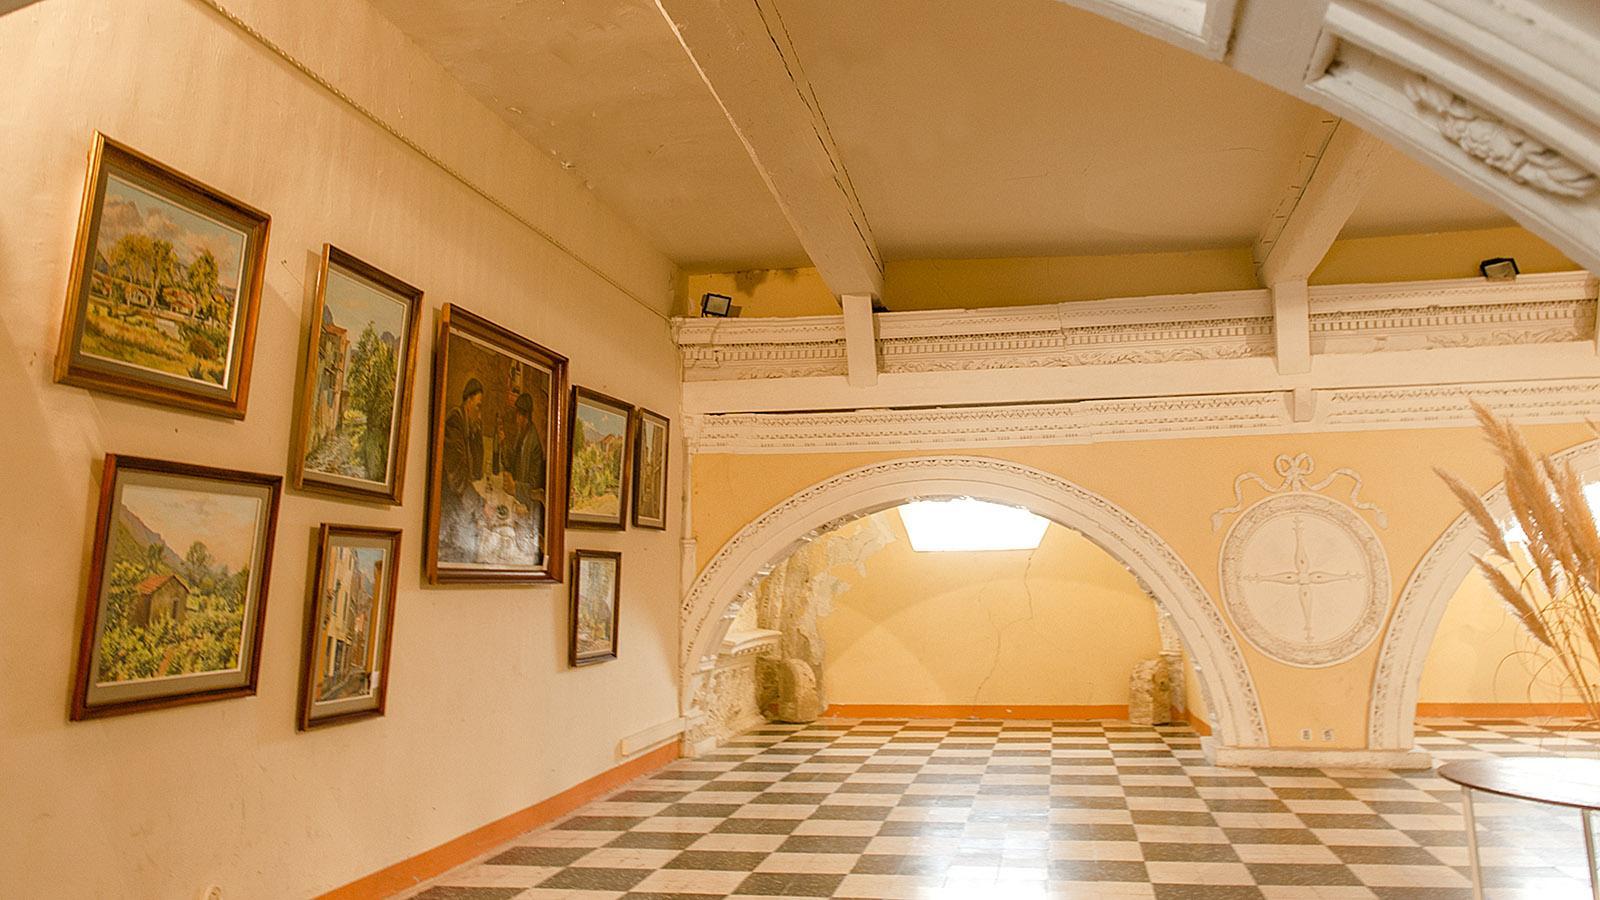 Saint-Paul-de-Fenouillet: die Kunstgalerie des Heimatmuseums findet ihr im Gewölbe des Chapître. Foto: Hilke Maunder